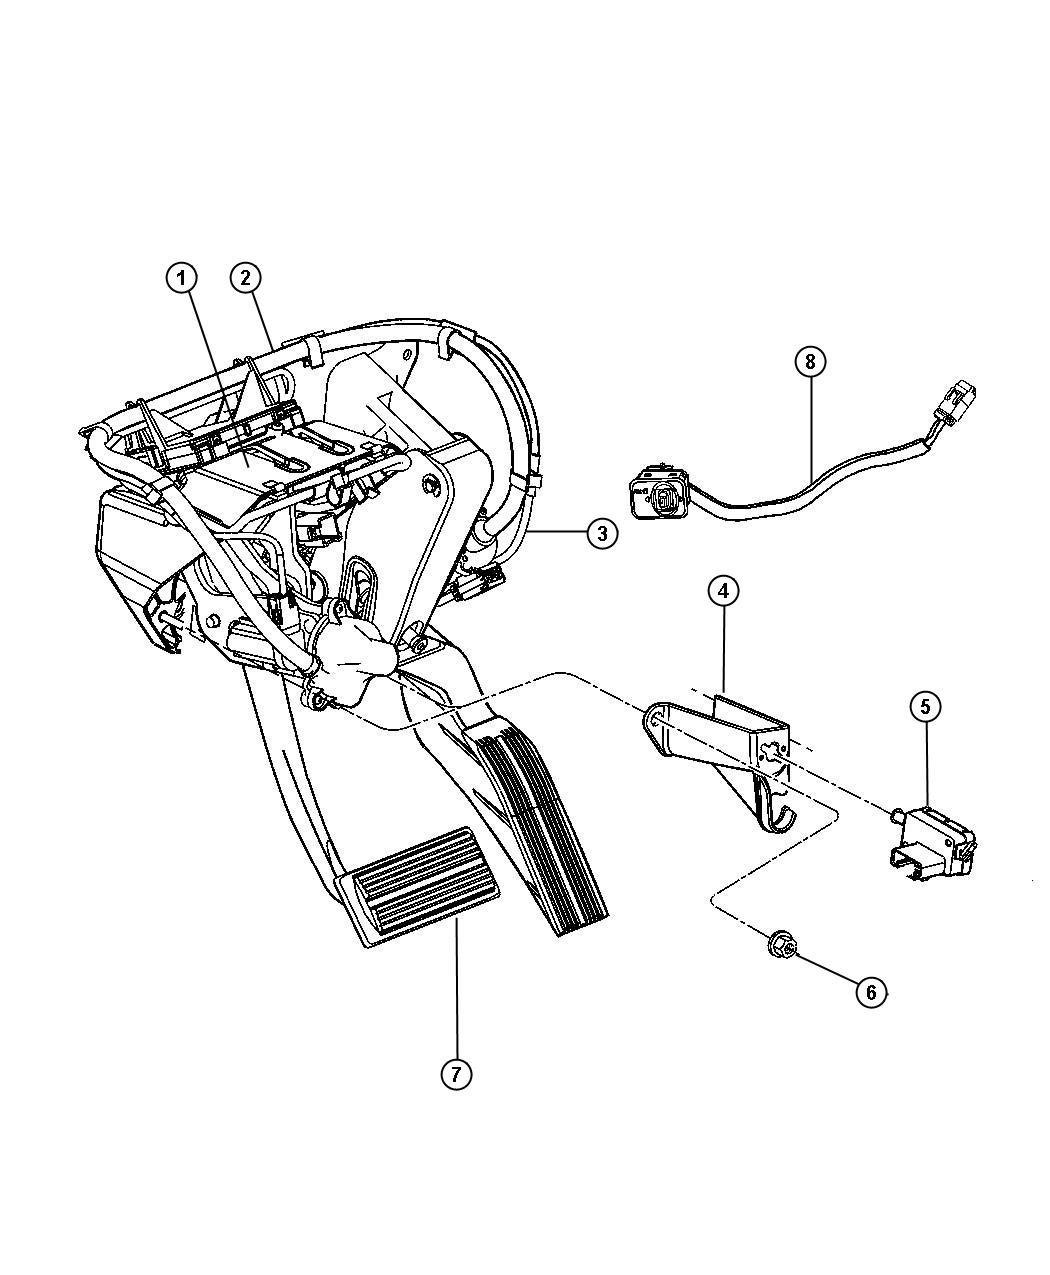 Pedal Brake Power Adjustable